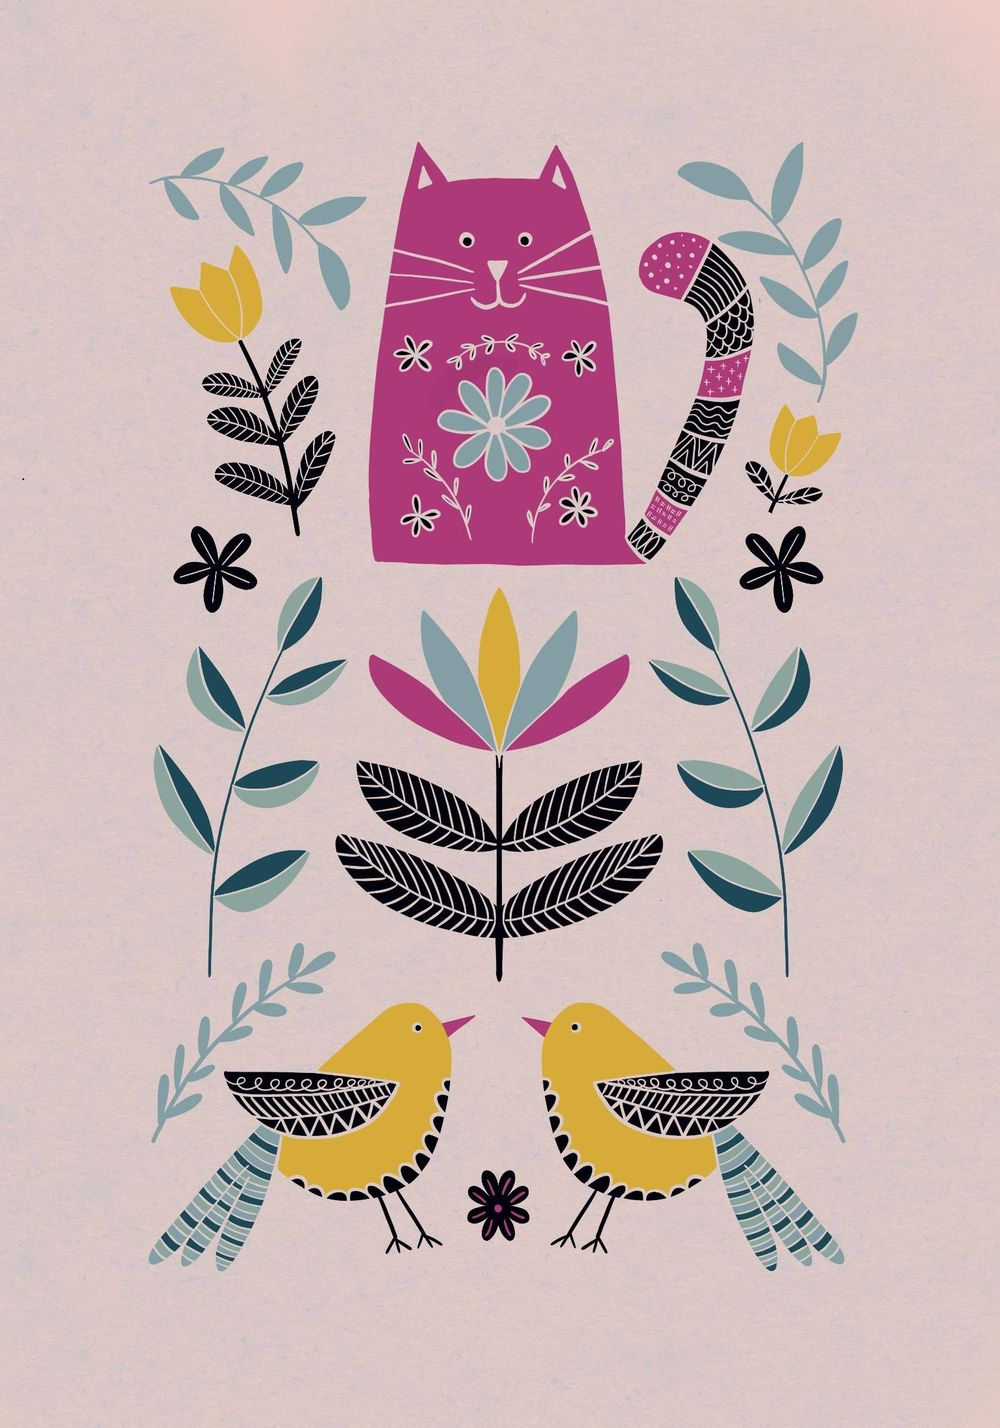 Folk art illustrations - image 1 - student project